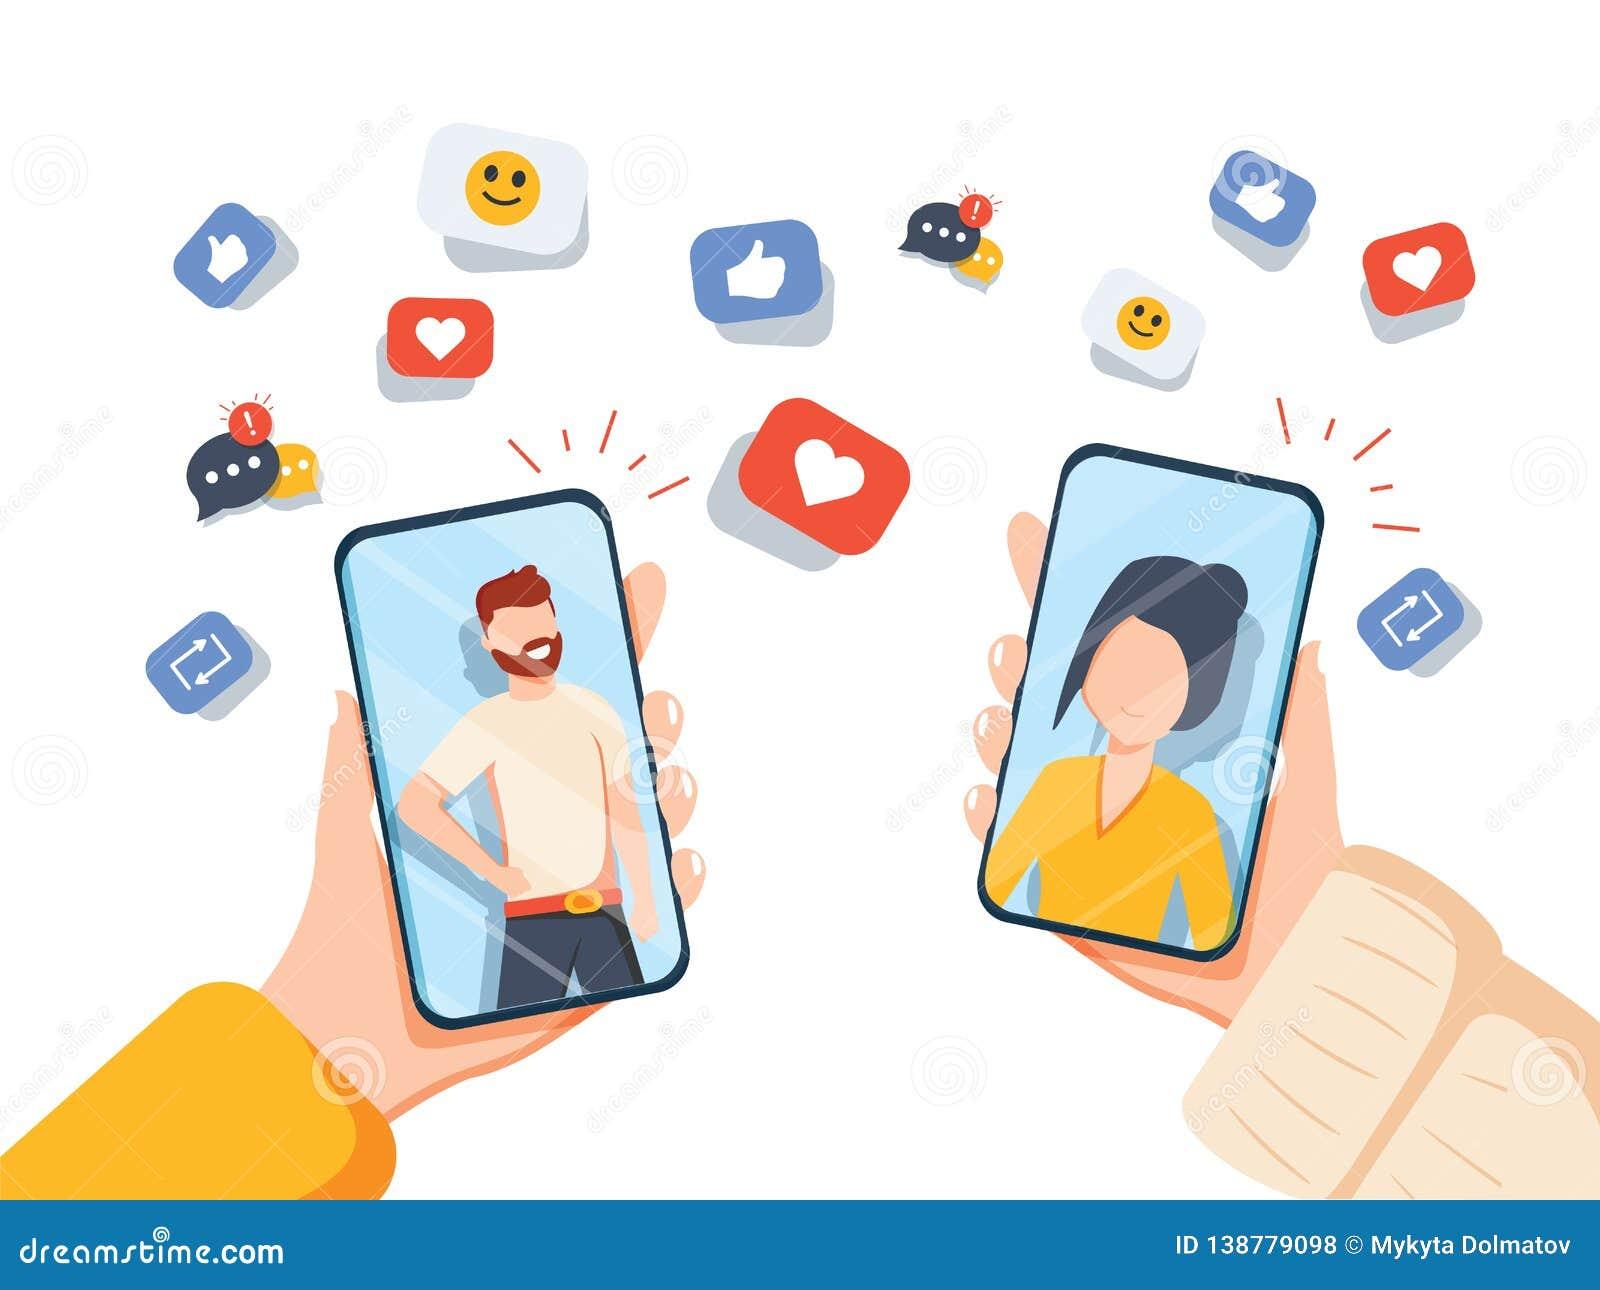 line dating app chanyeol dating alleen eng sub te downloaden